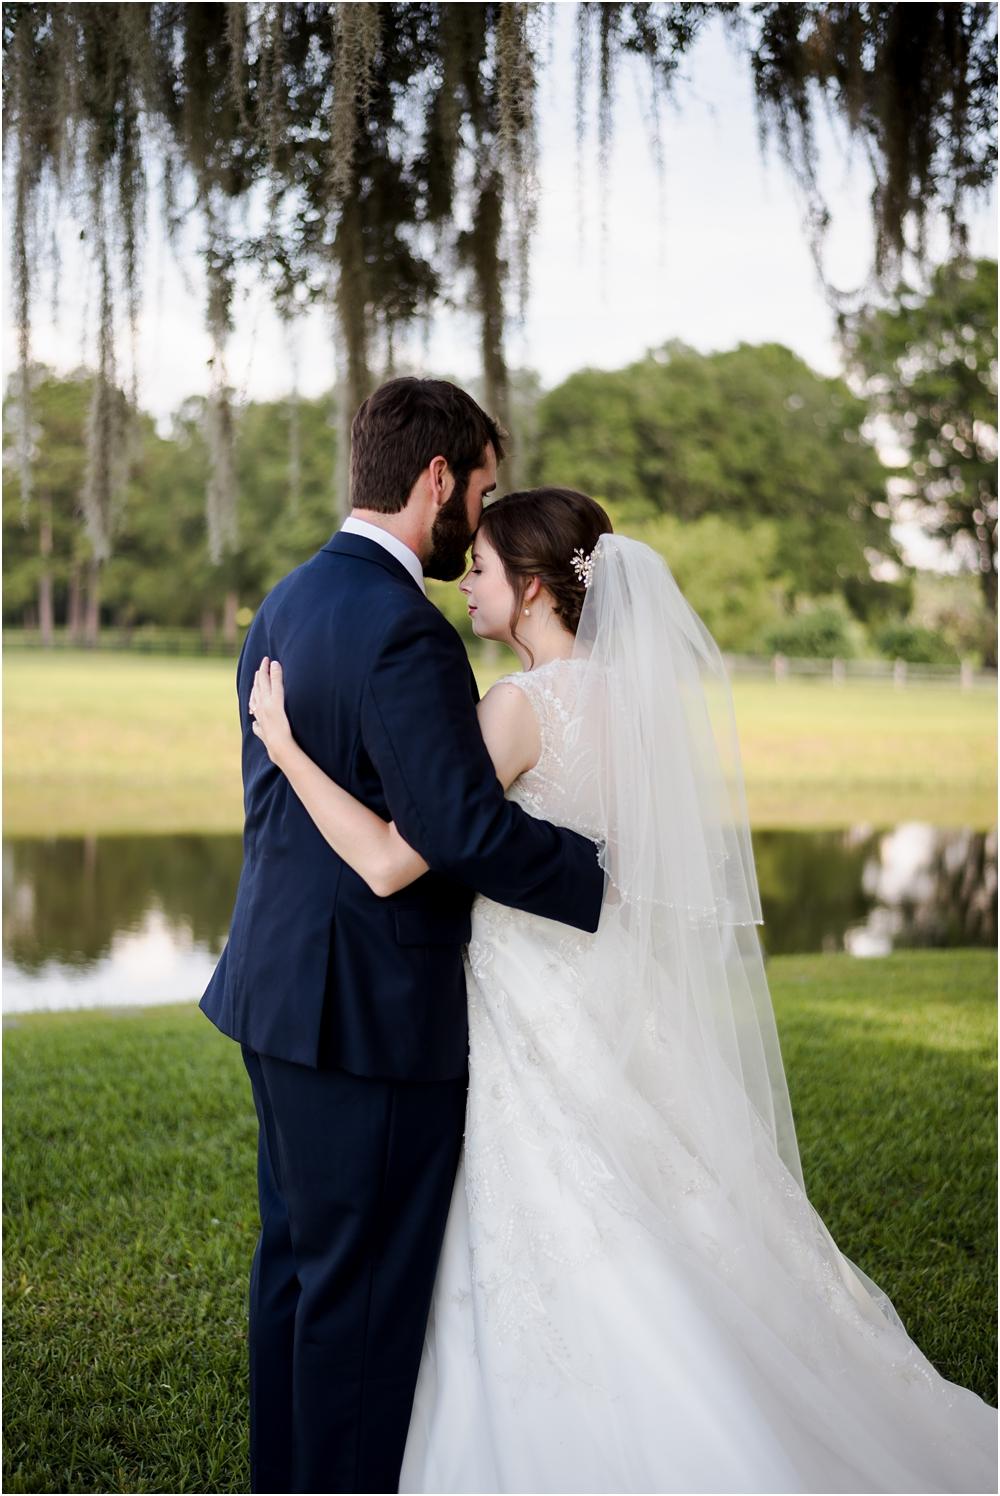 marianna-florida-wedding-photographer-kiersten-grant-54.jpg